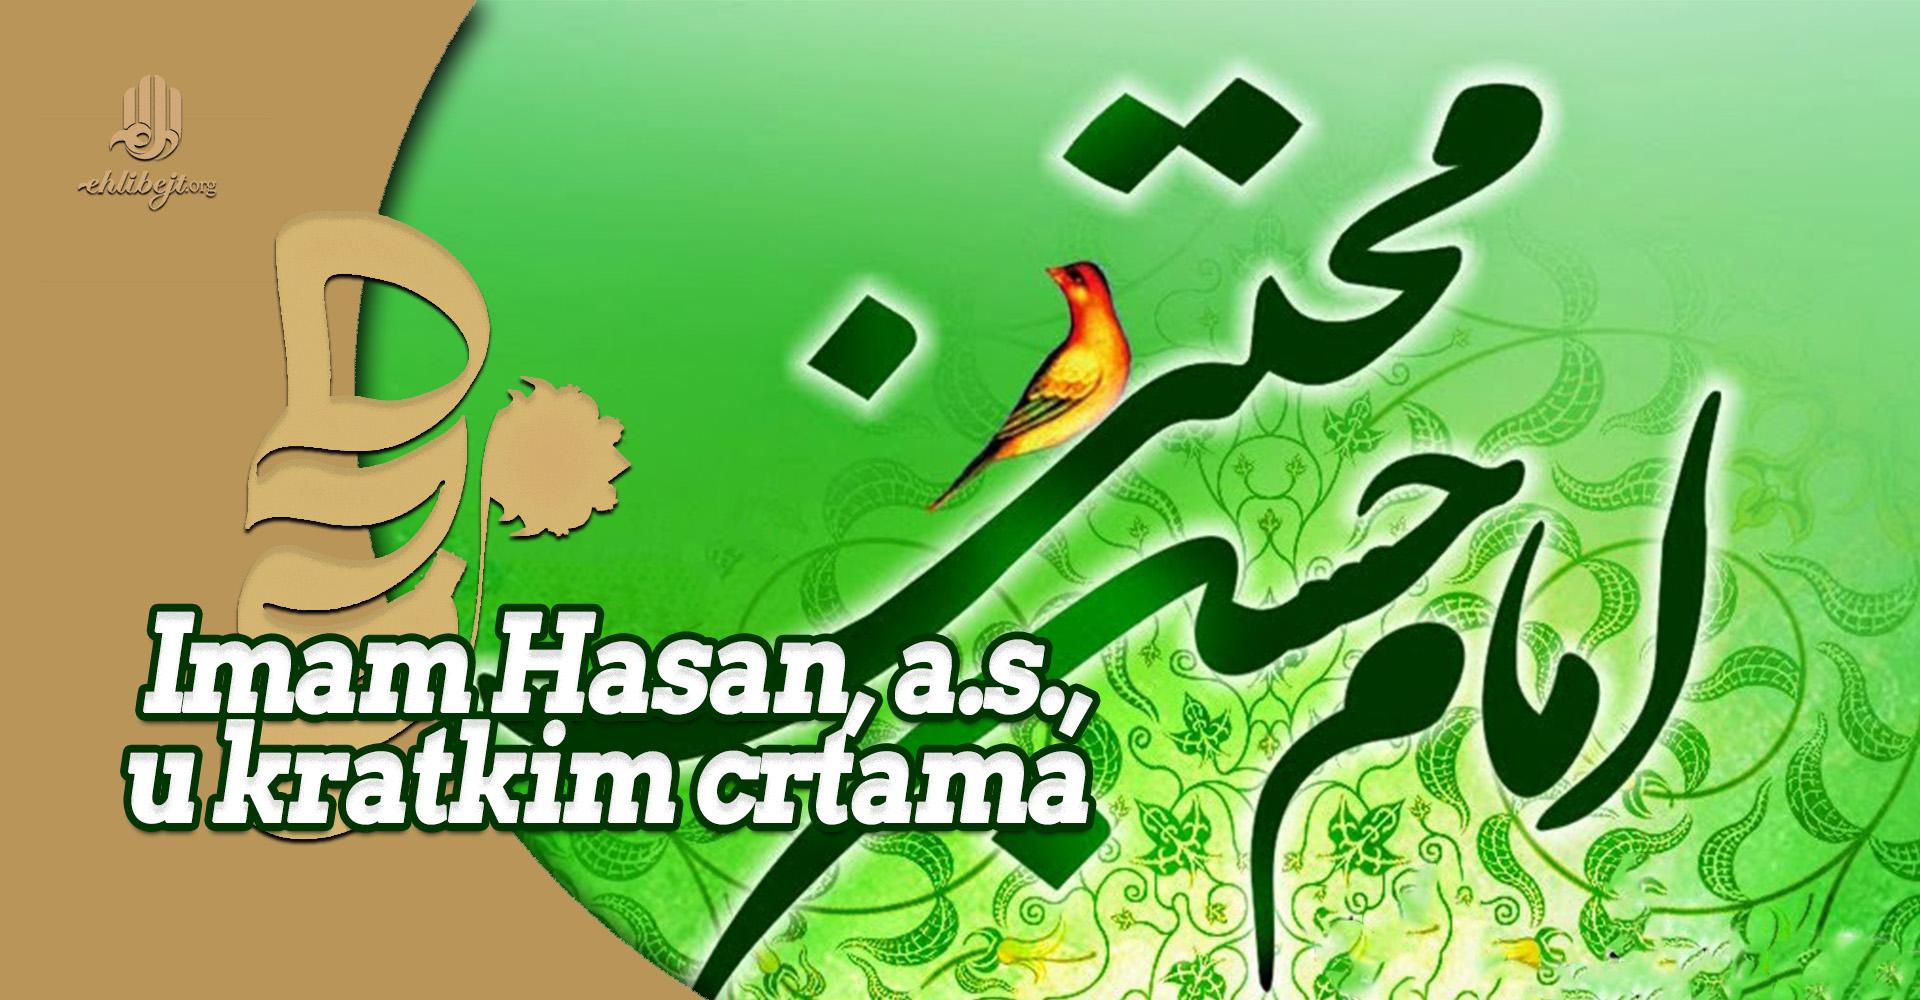 Imam Hasan, a.s., u kratkim crtama